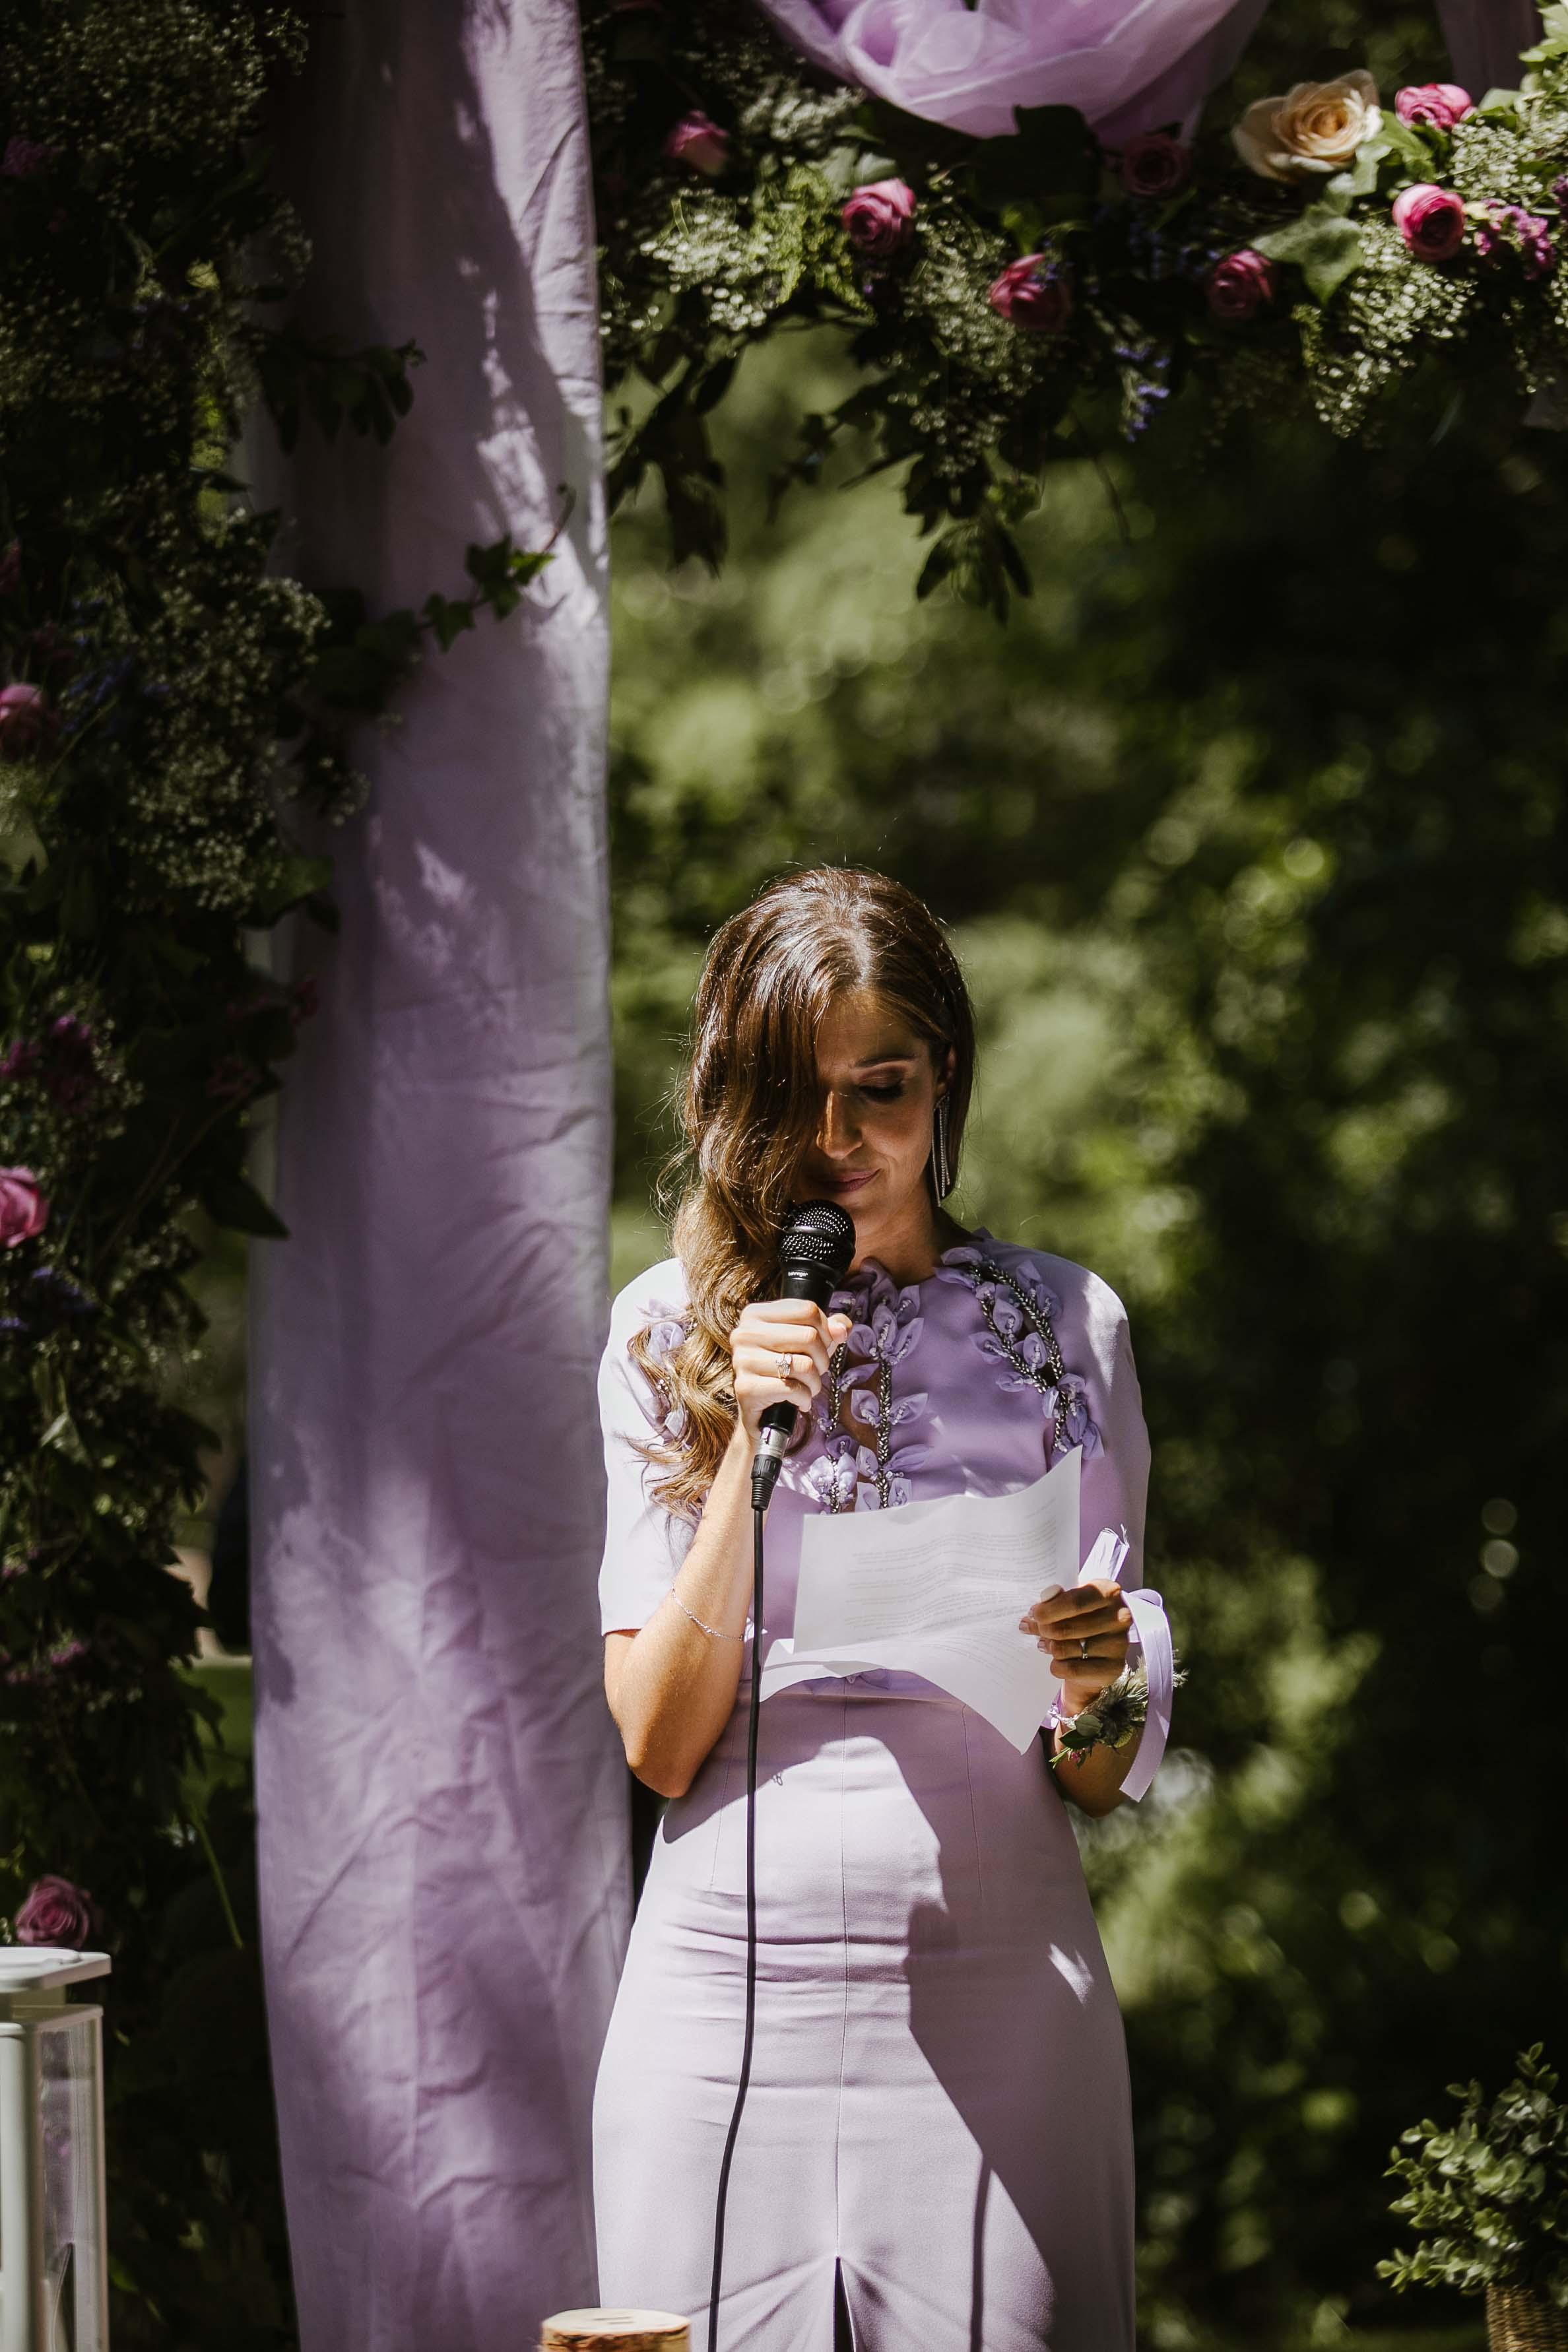 discurso hermana novia boda